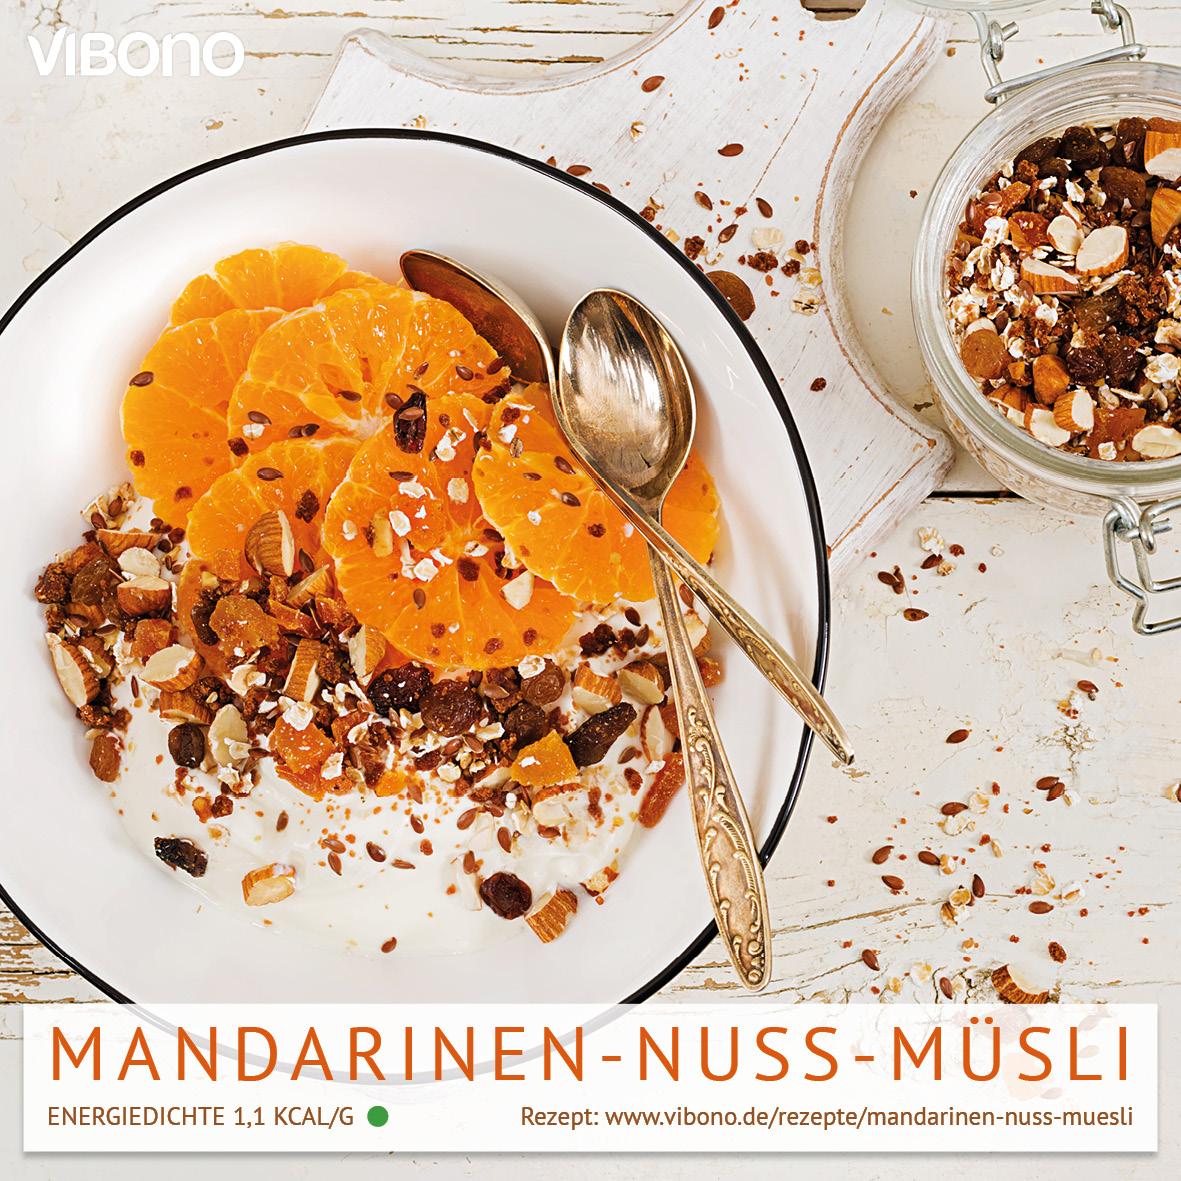 Mandarinen-Nuss-Müsli